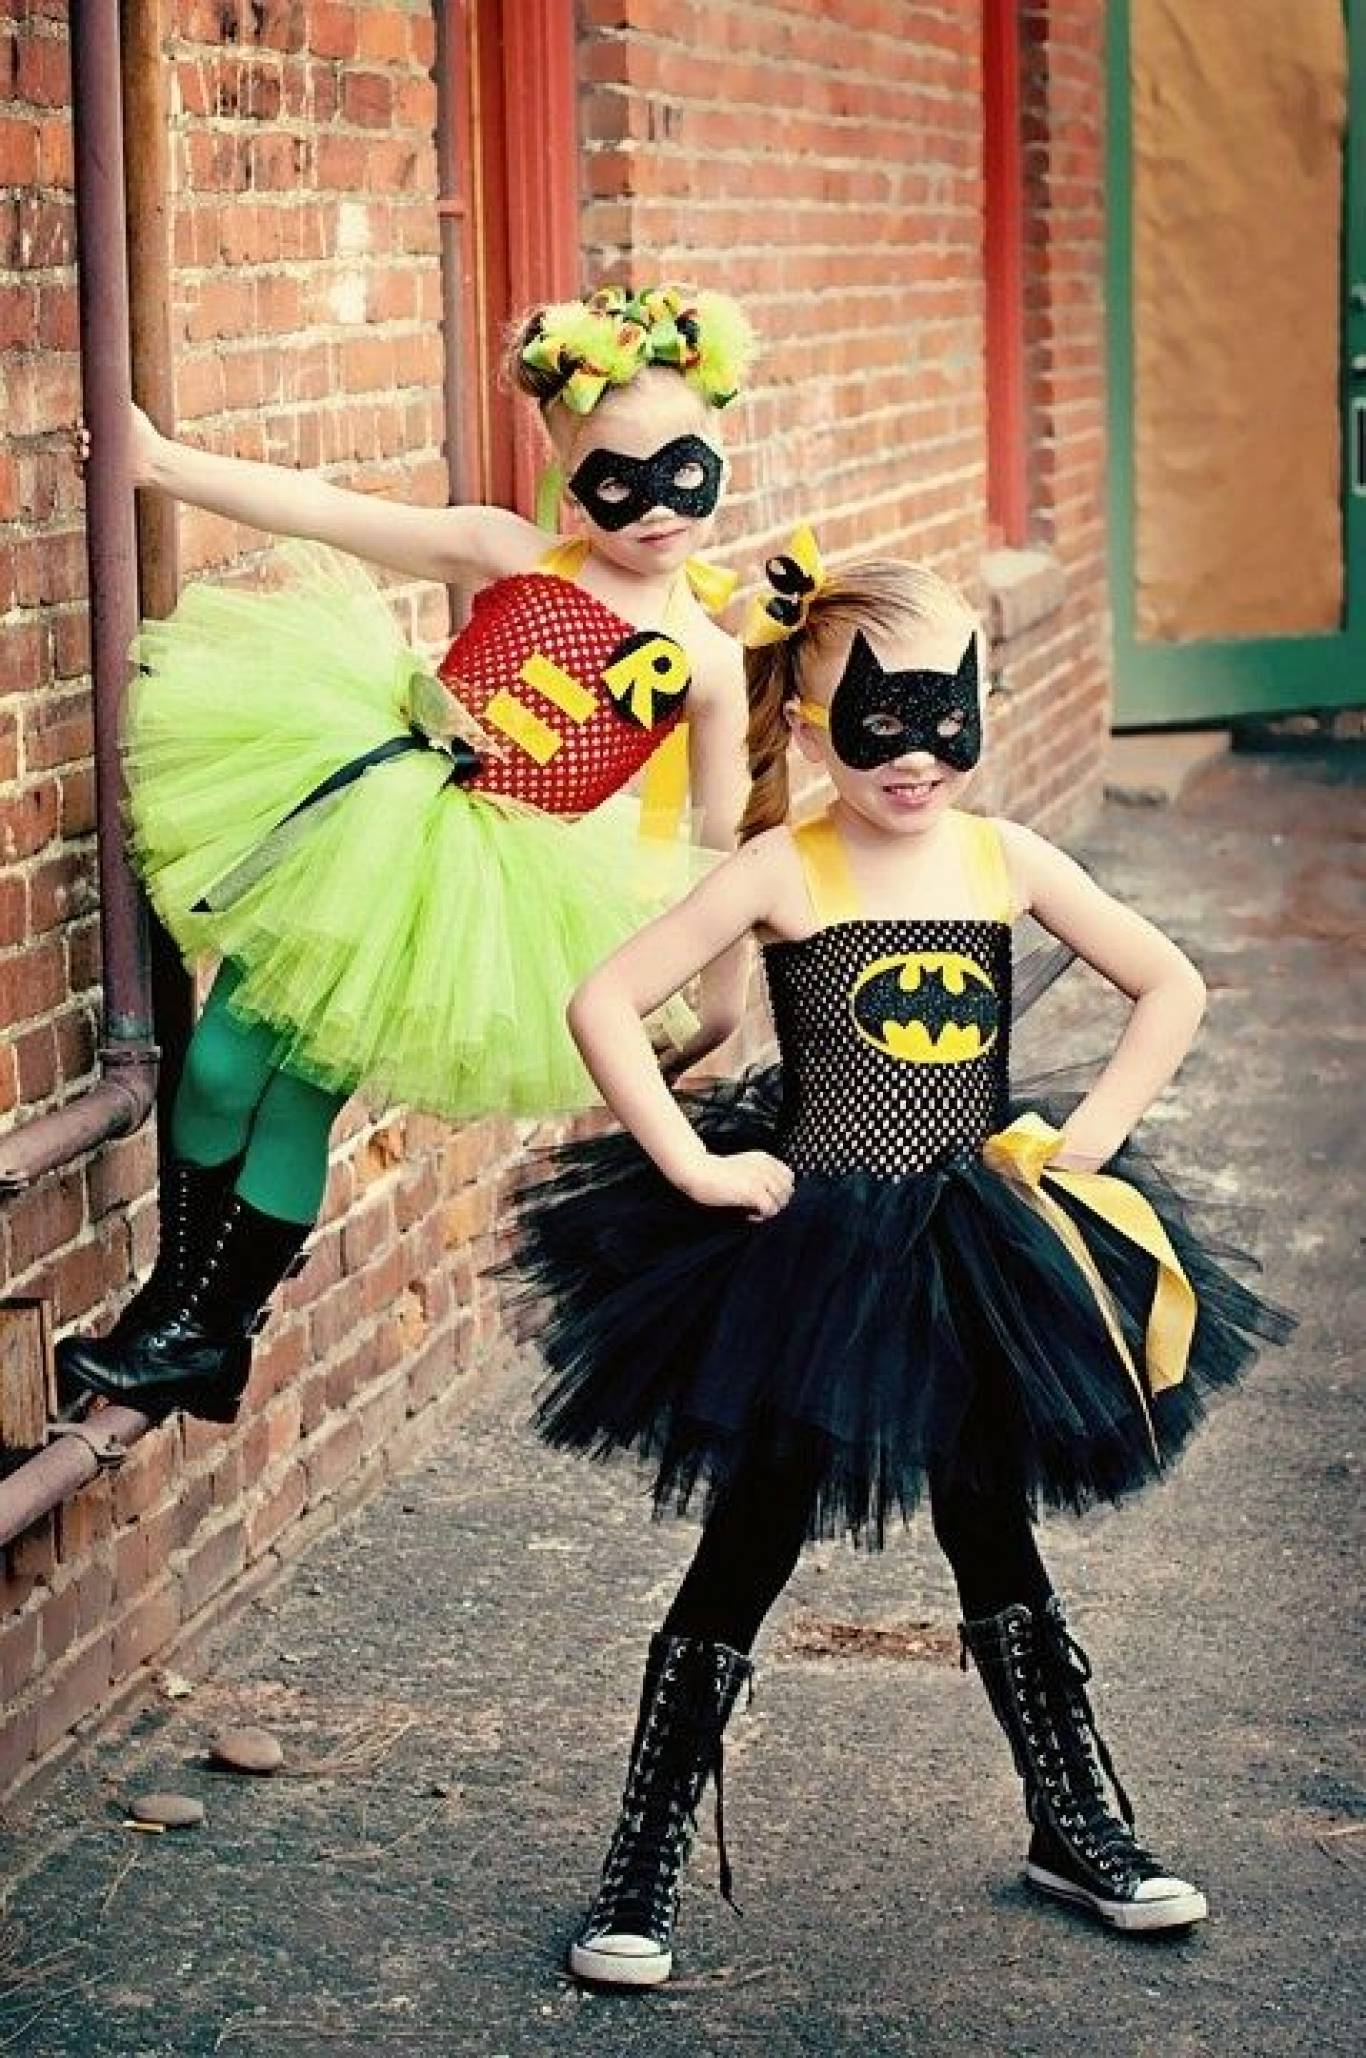 АКВА Halloween: розважальна програма в Аквапарку Dream Island